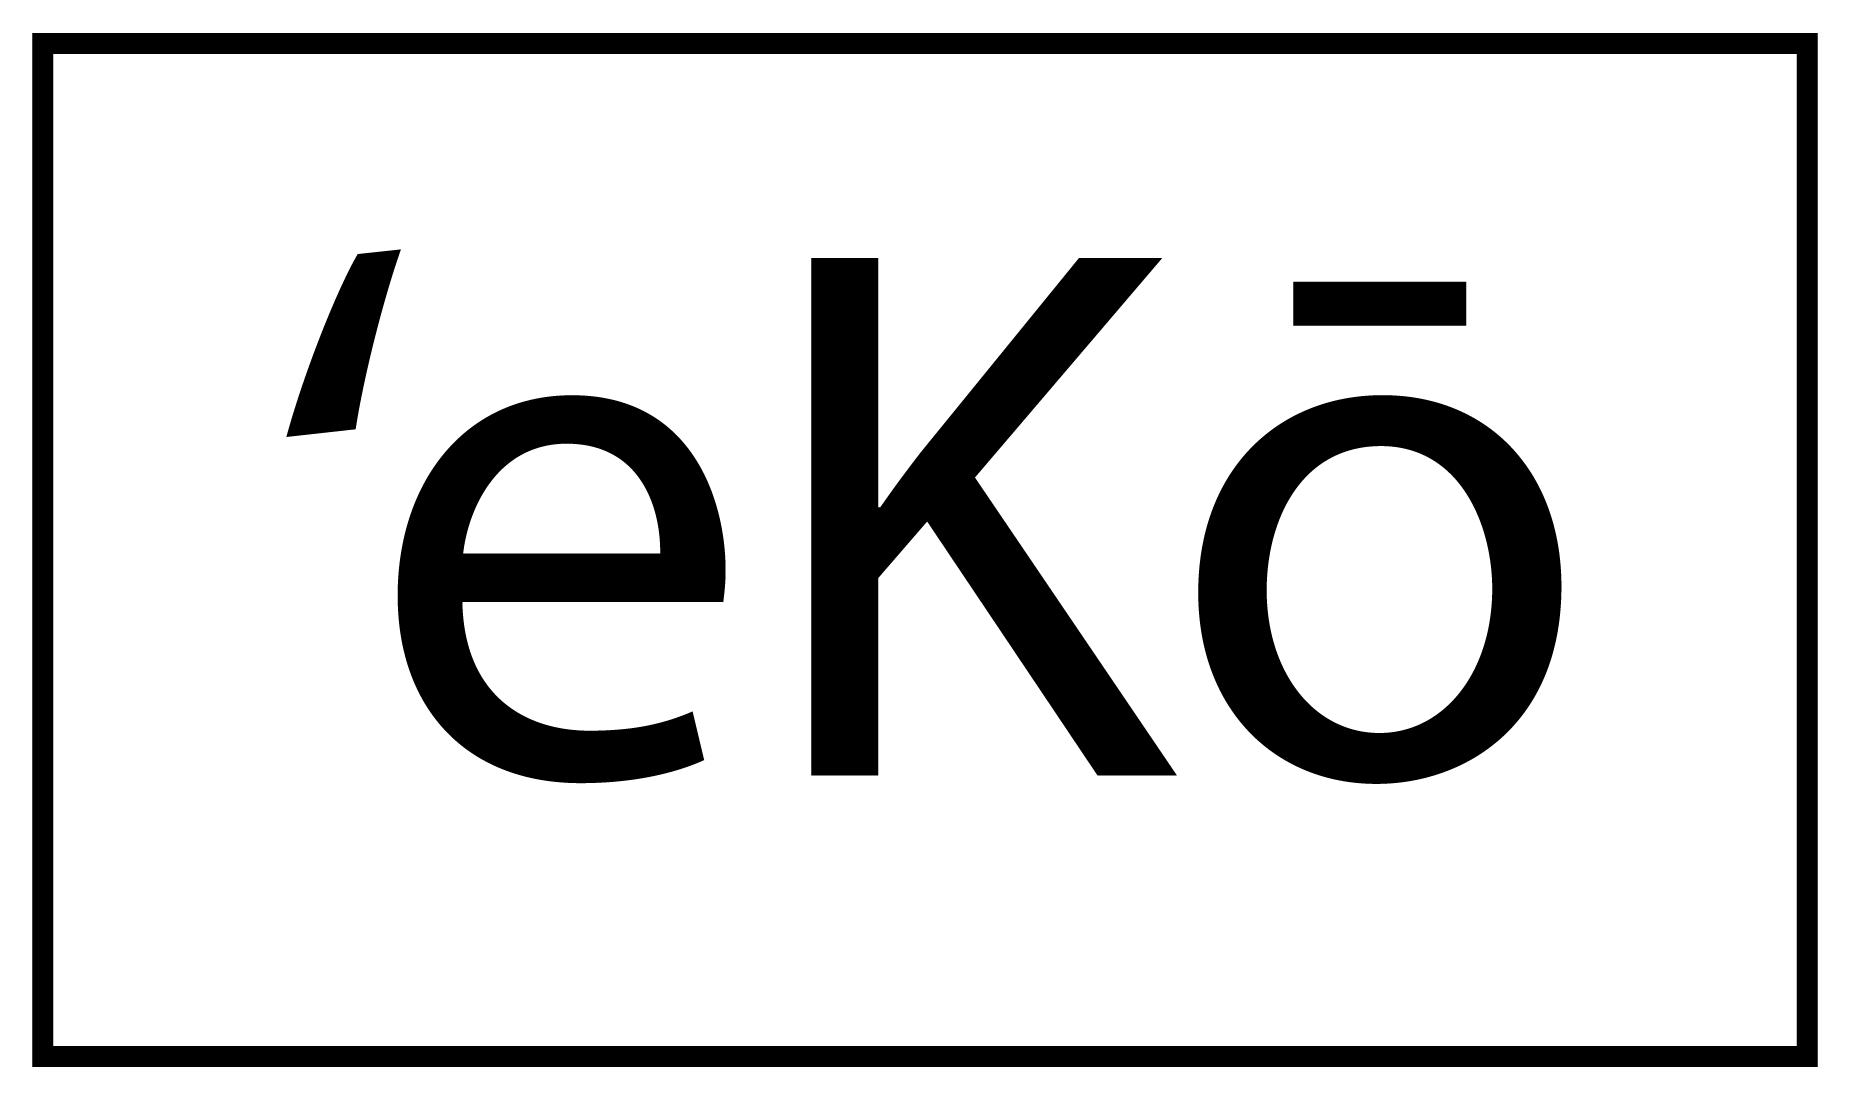 ˈekō Films logo